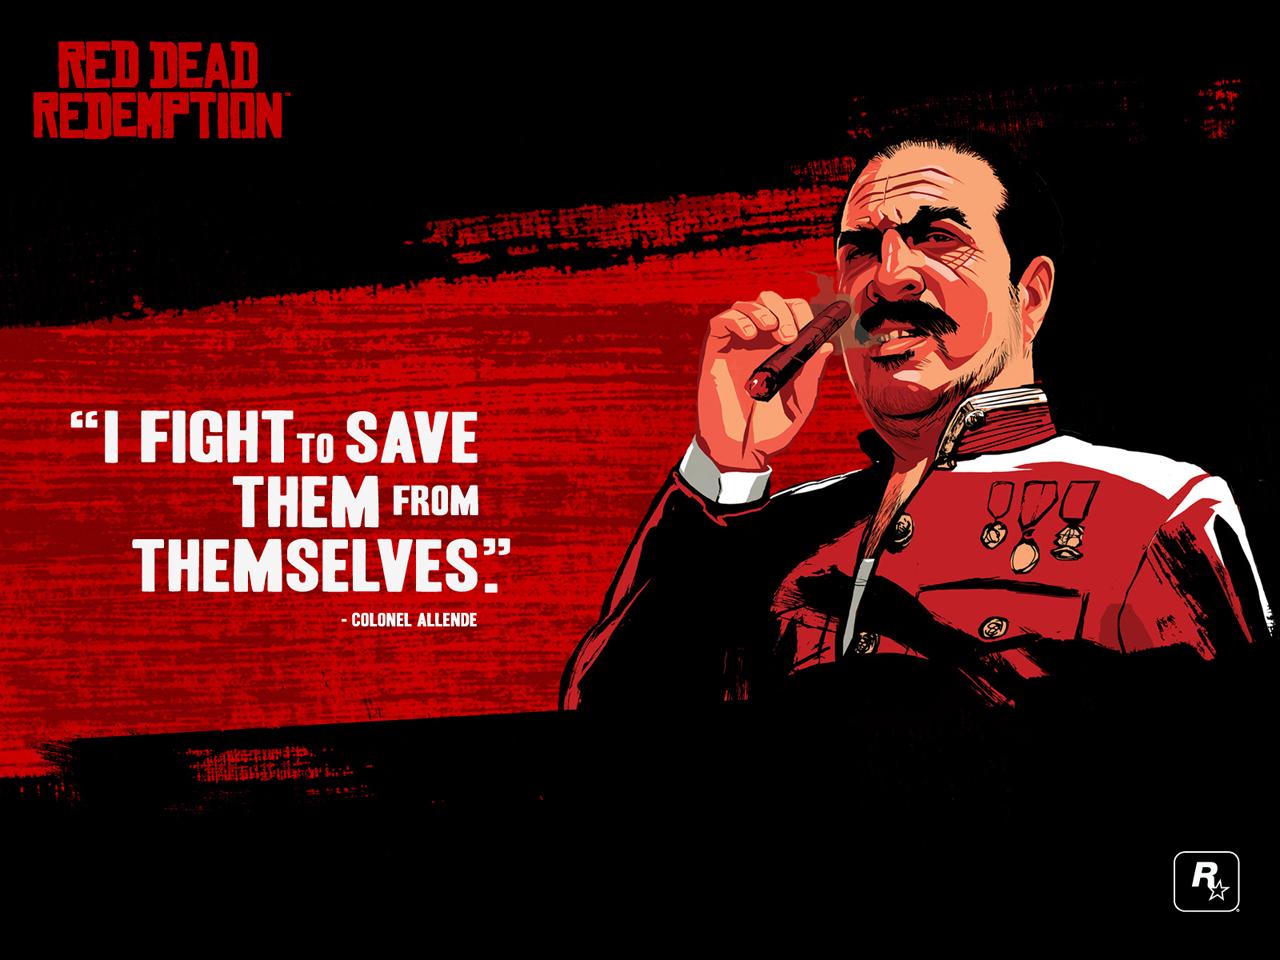 Free Download Red Dead Redemption Images Rdr Wallpaper Hd